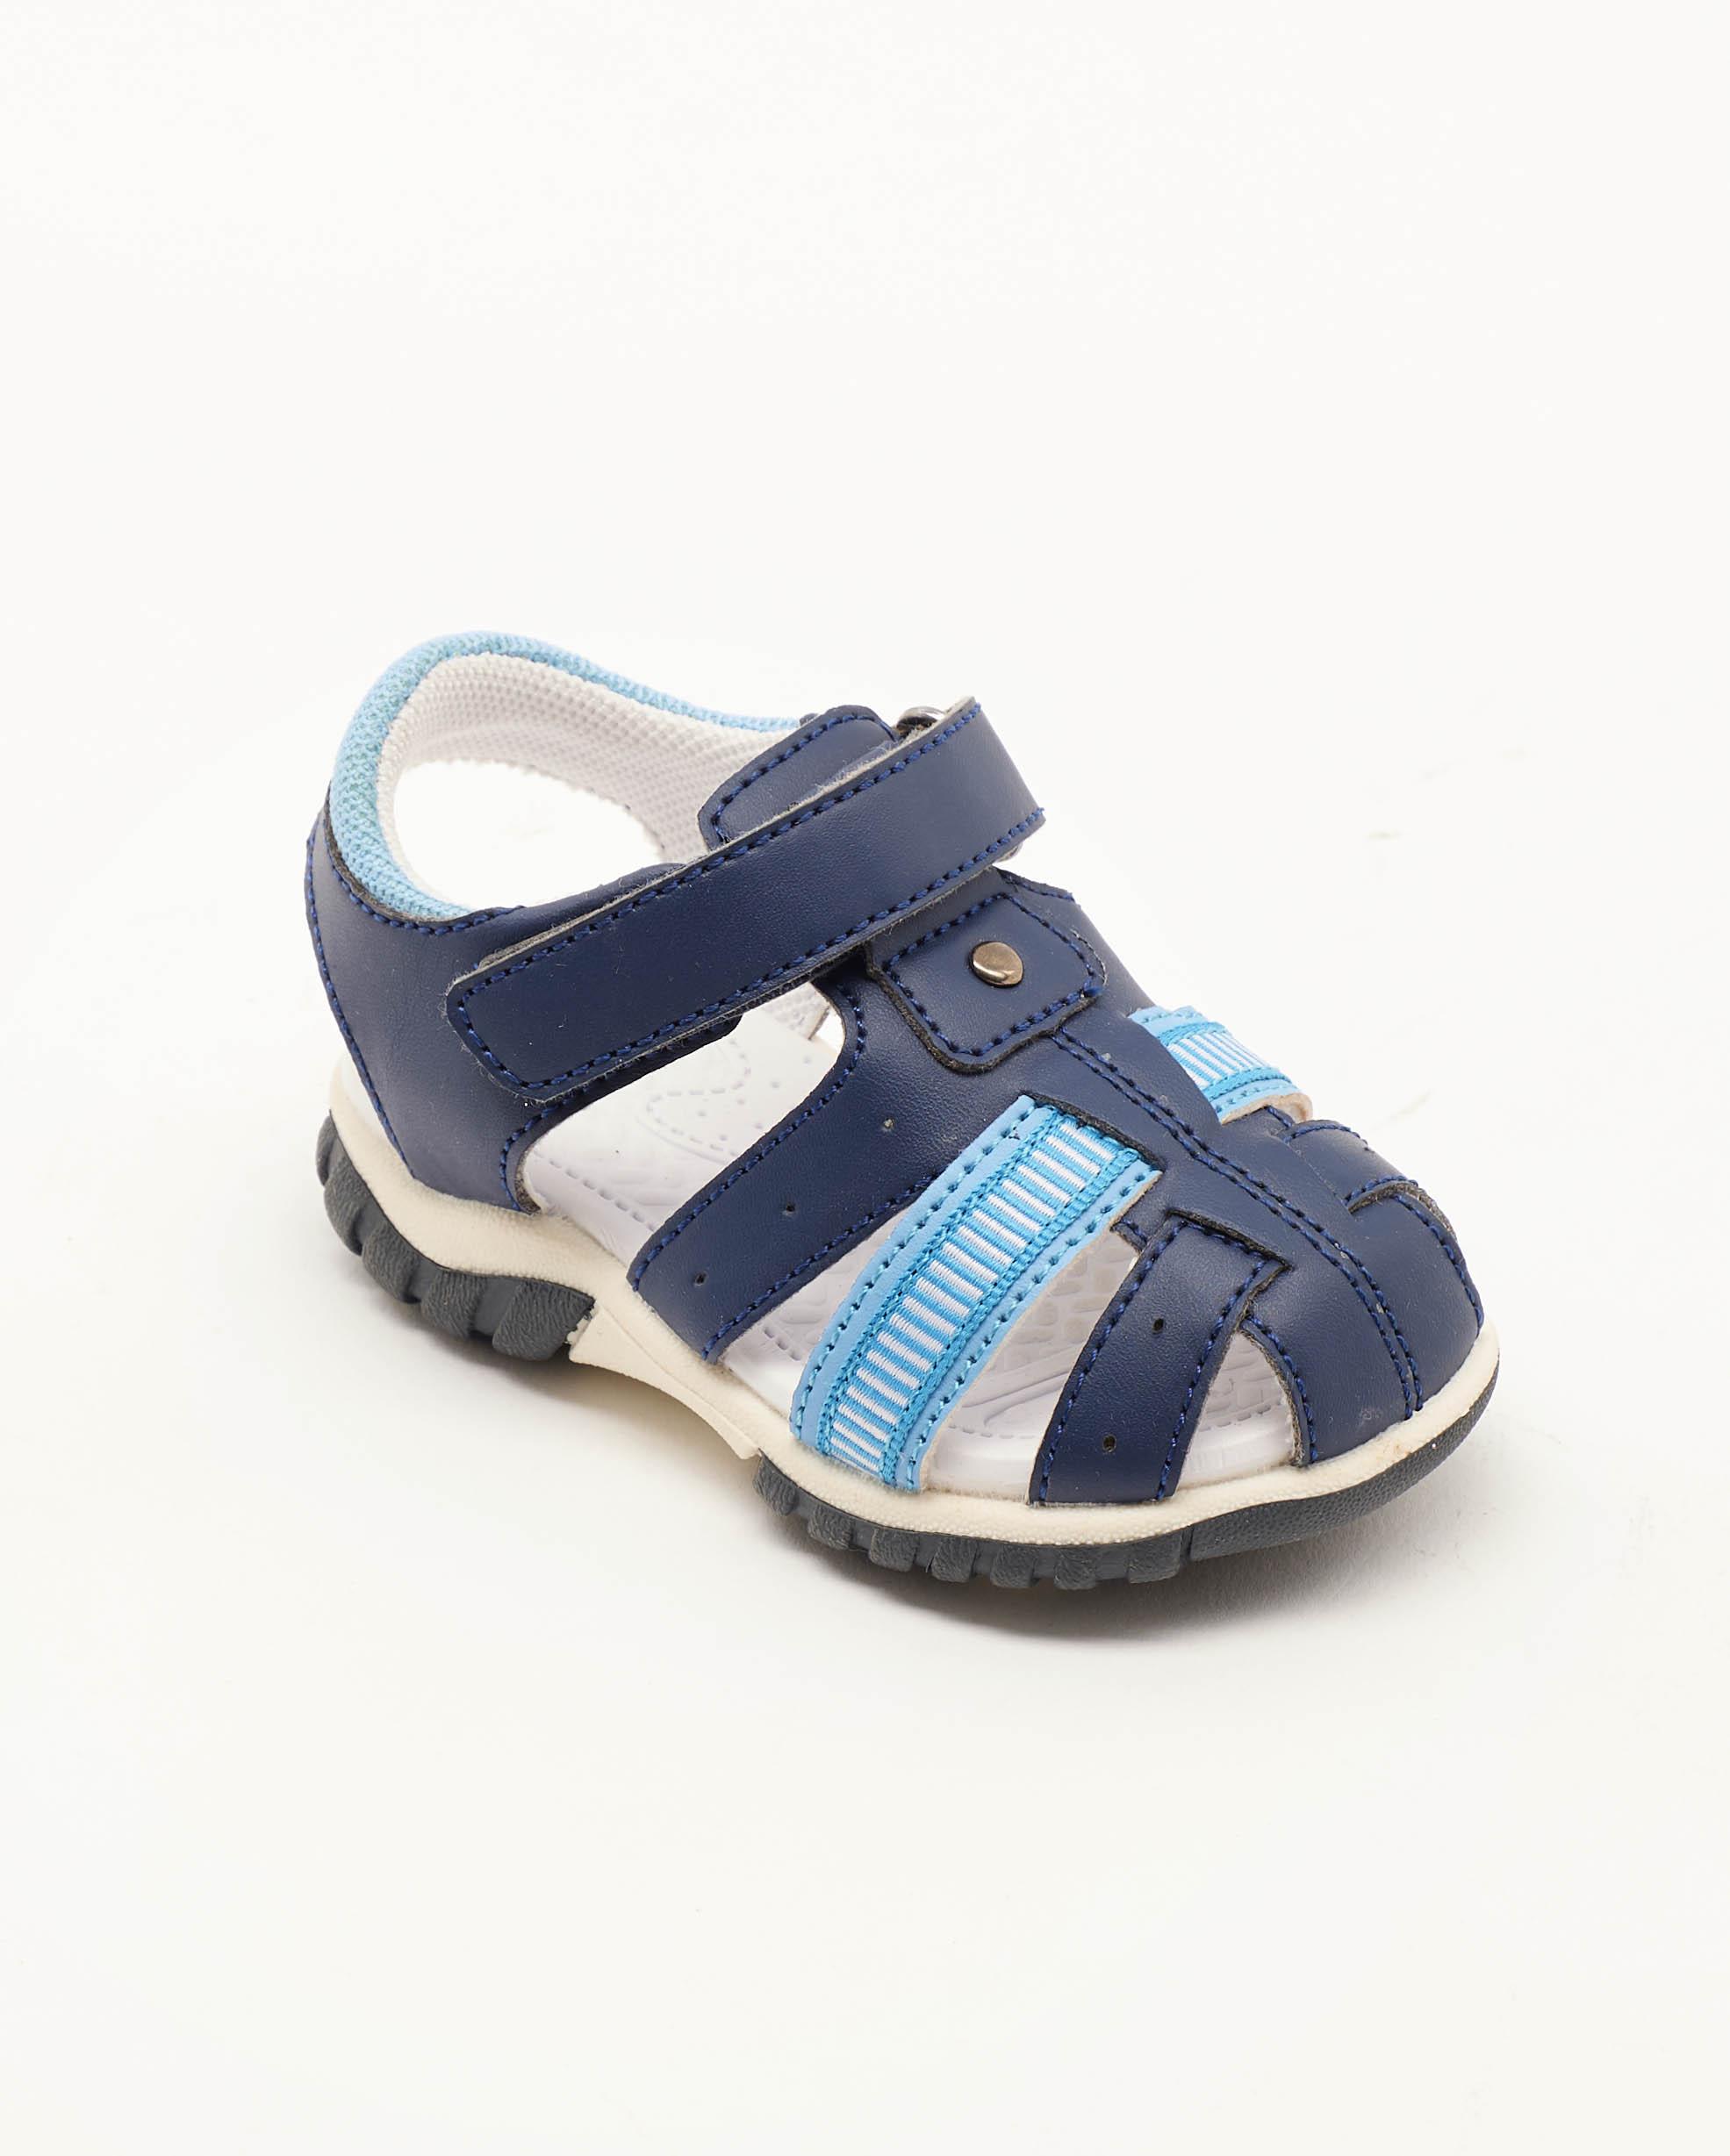 Sandales Bébé Garçon - Sandale Ouverte Marine Jina - Xdb01-700111